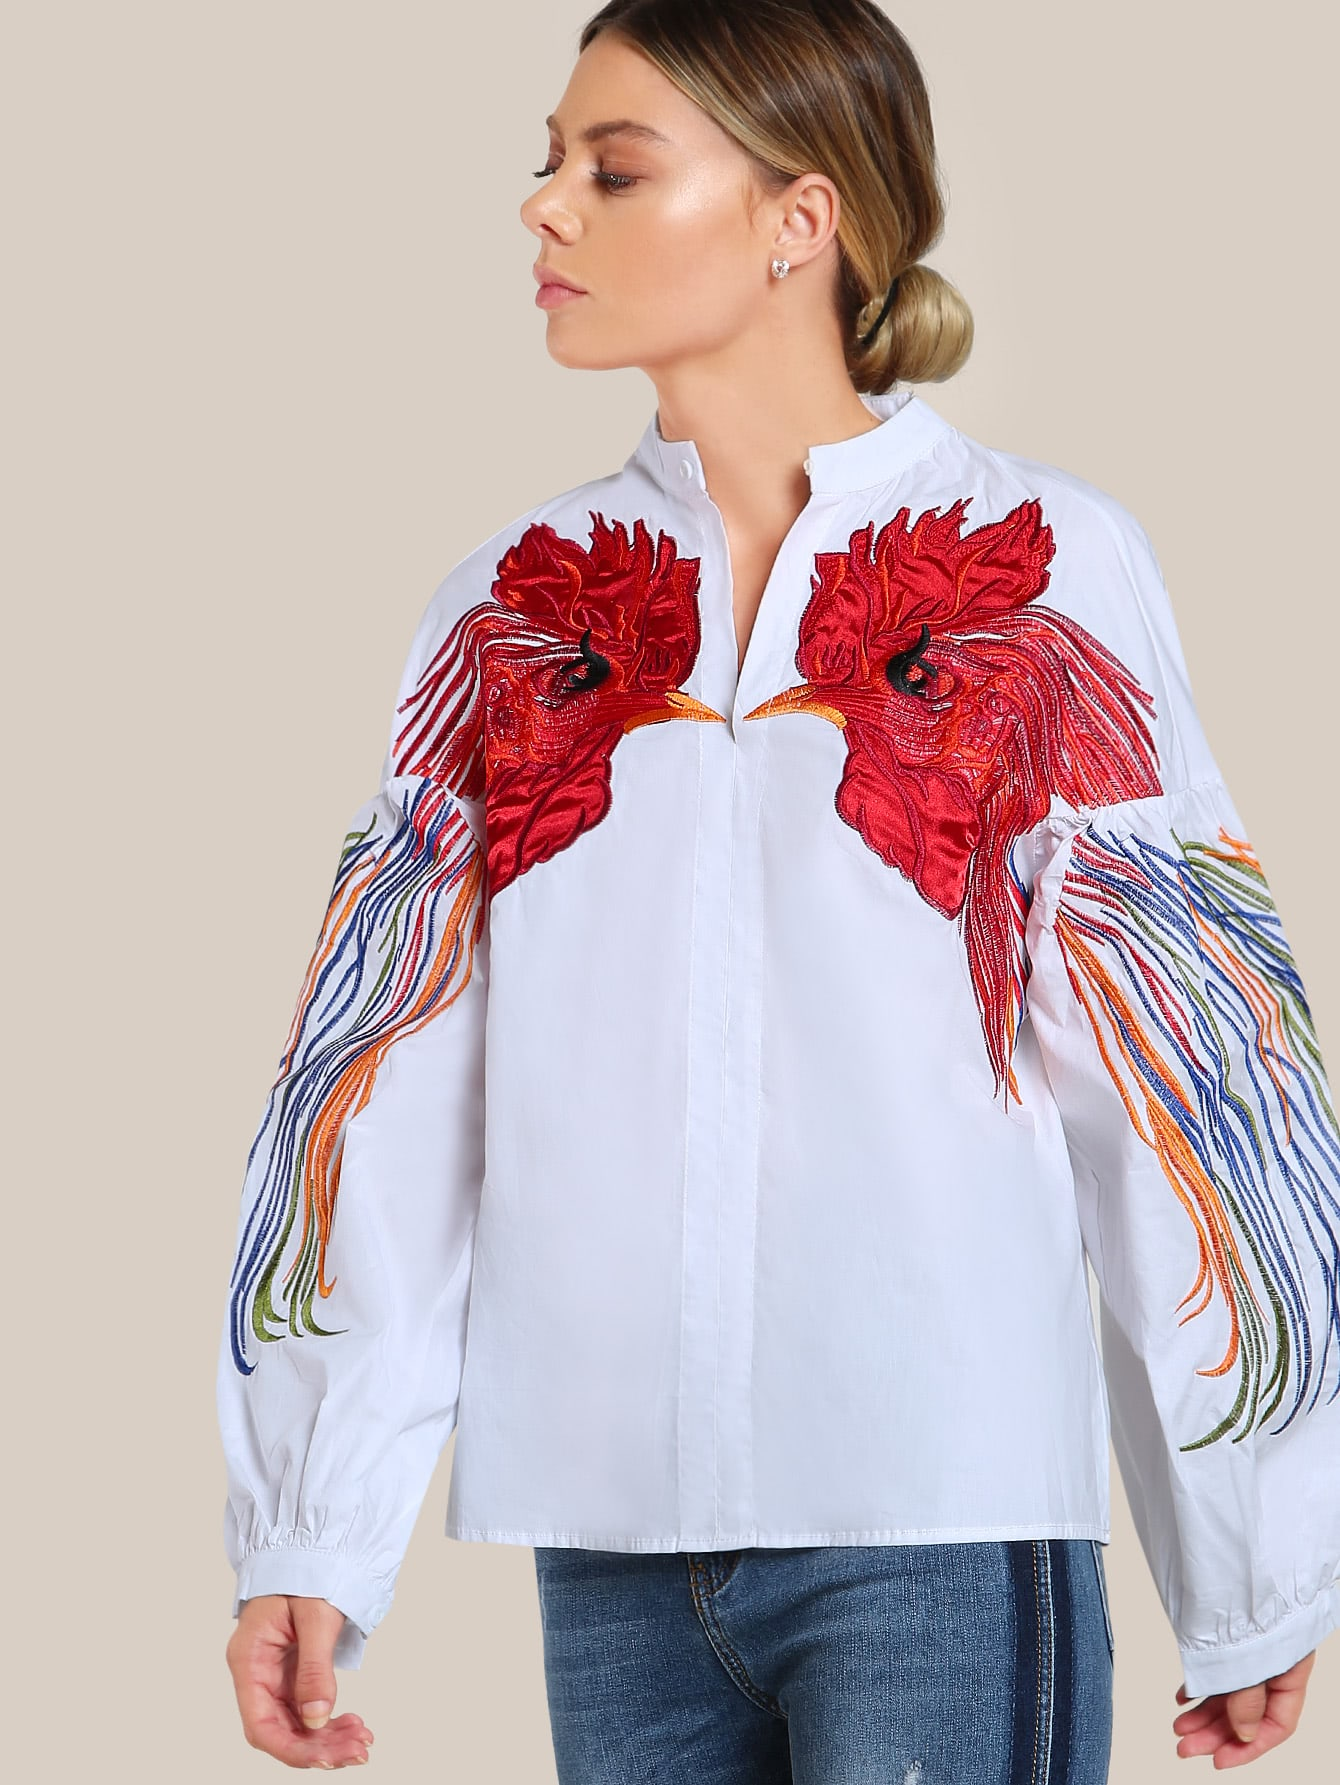 Bird Embroidered Lantern Sleeve Top